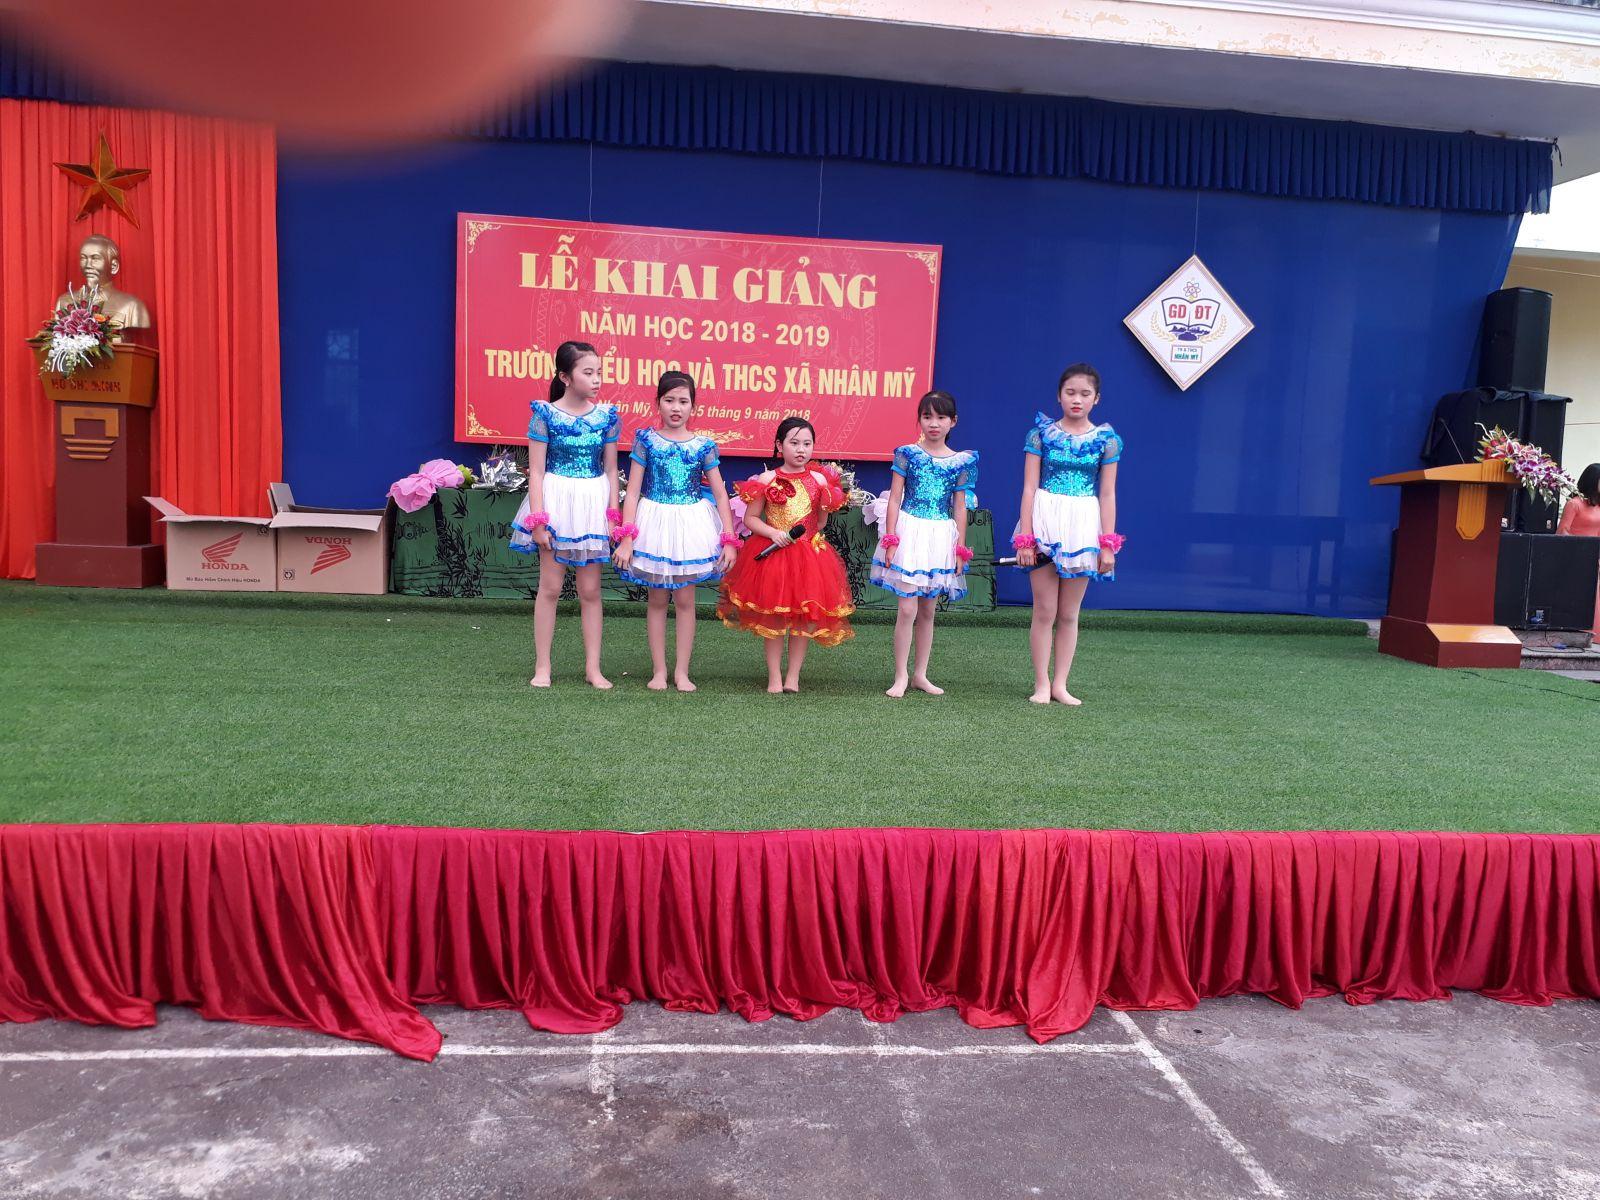 Description: D:NAM HOC 2018-2019ANH CAC HOAT DONGANH KHAI GIANG20180905_084044.jpg